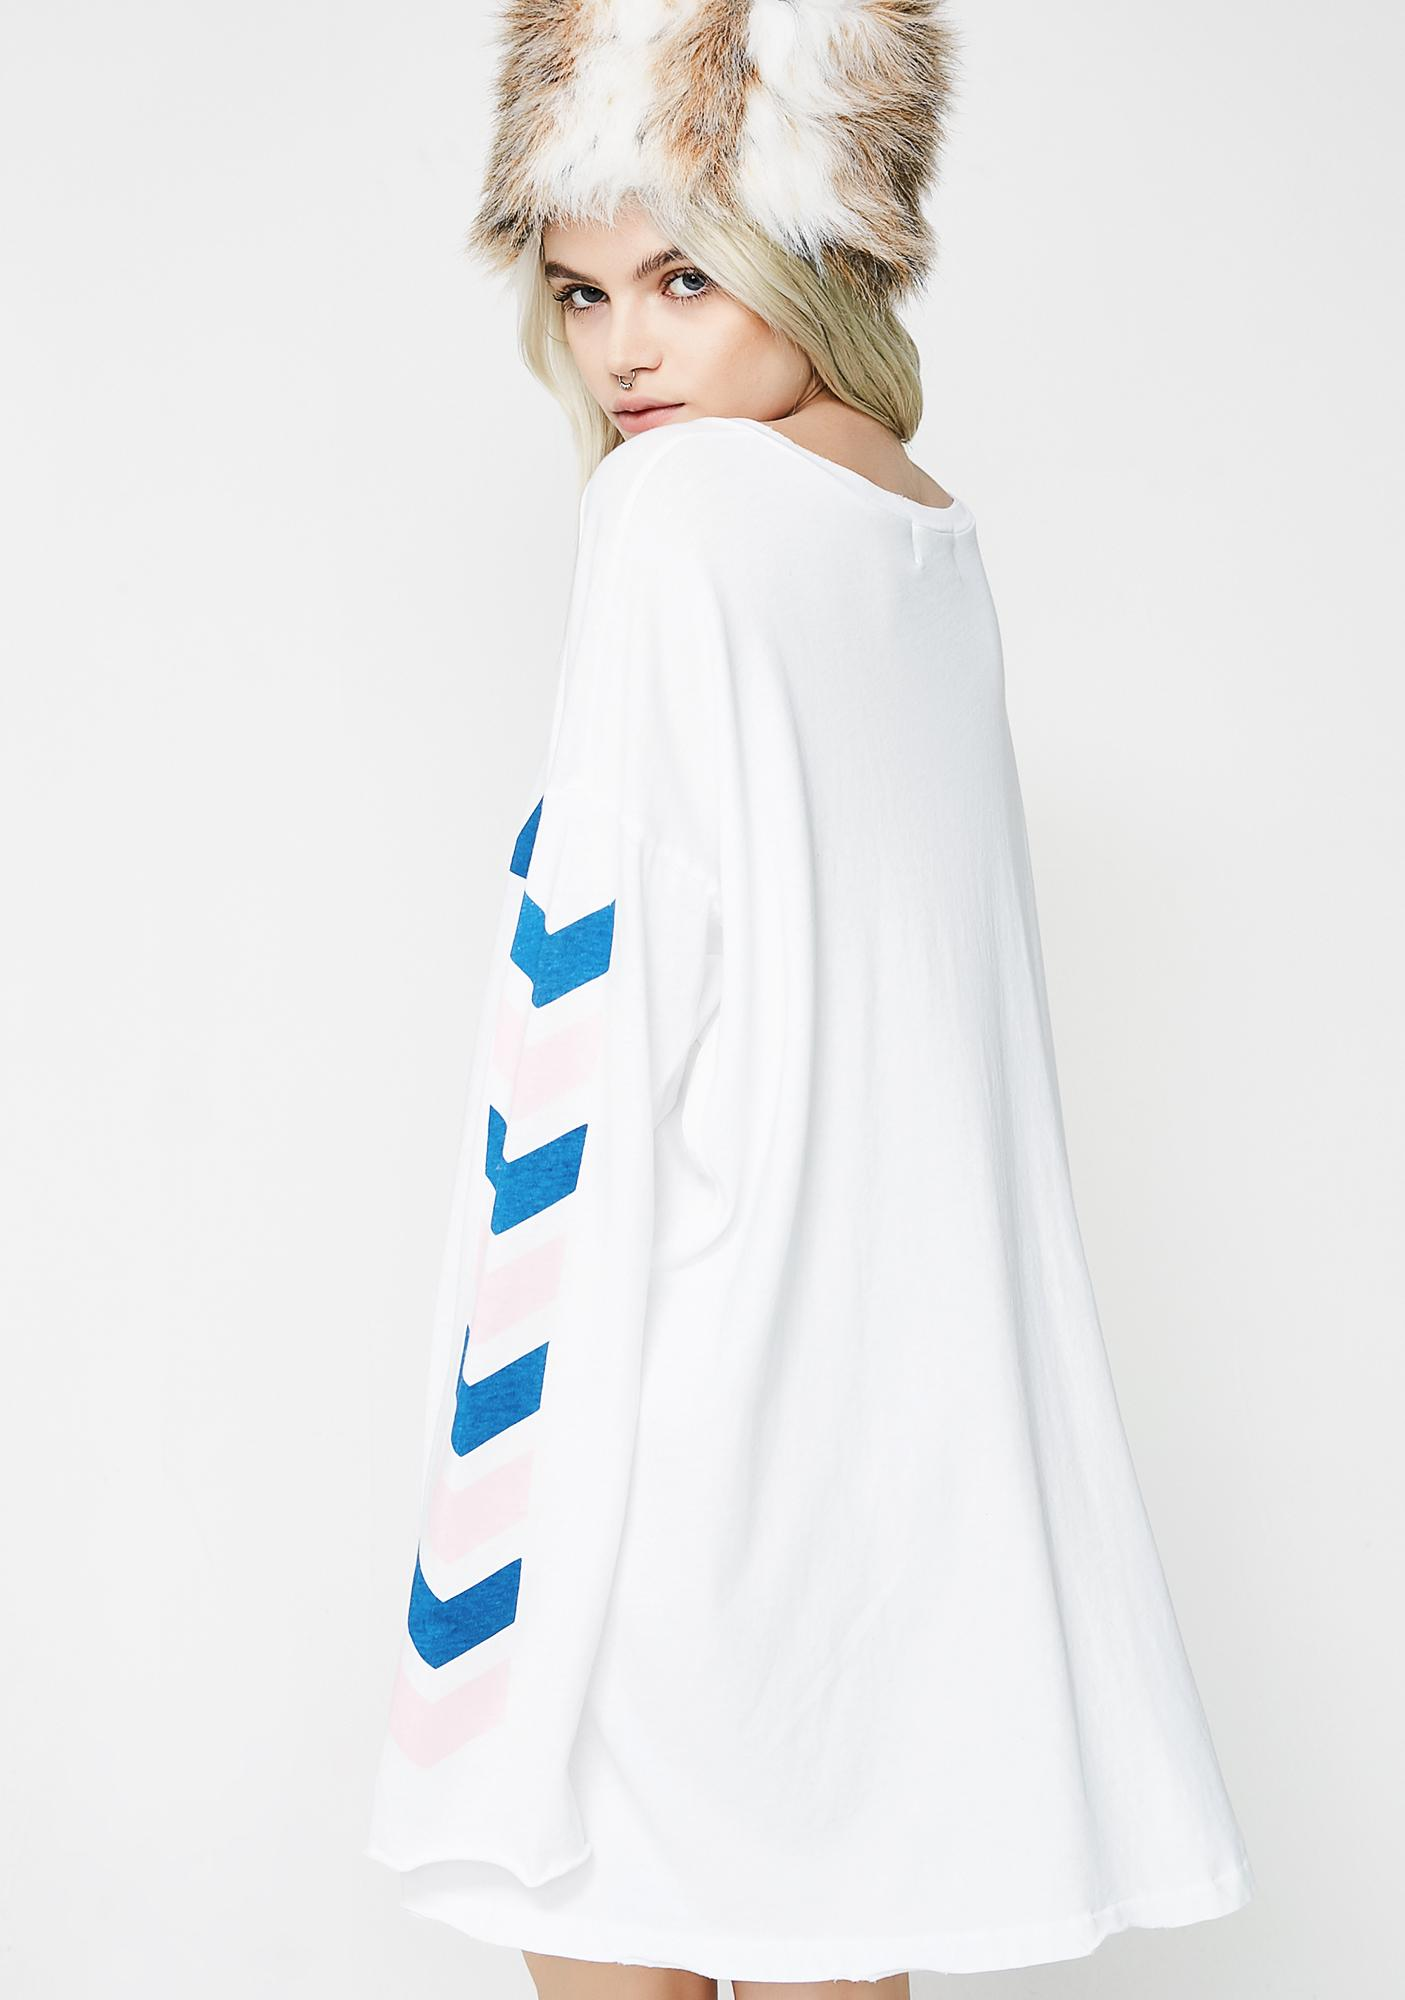 Wildfox Couture 1984 Zena Tunic